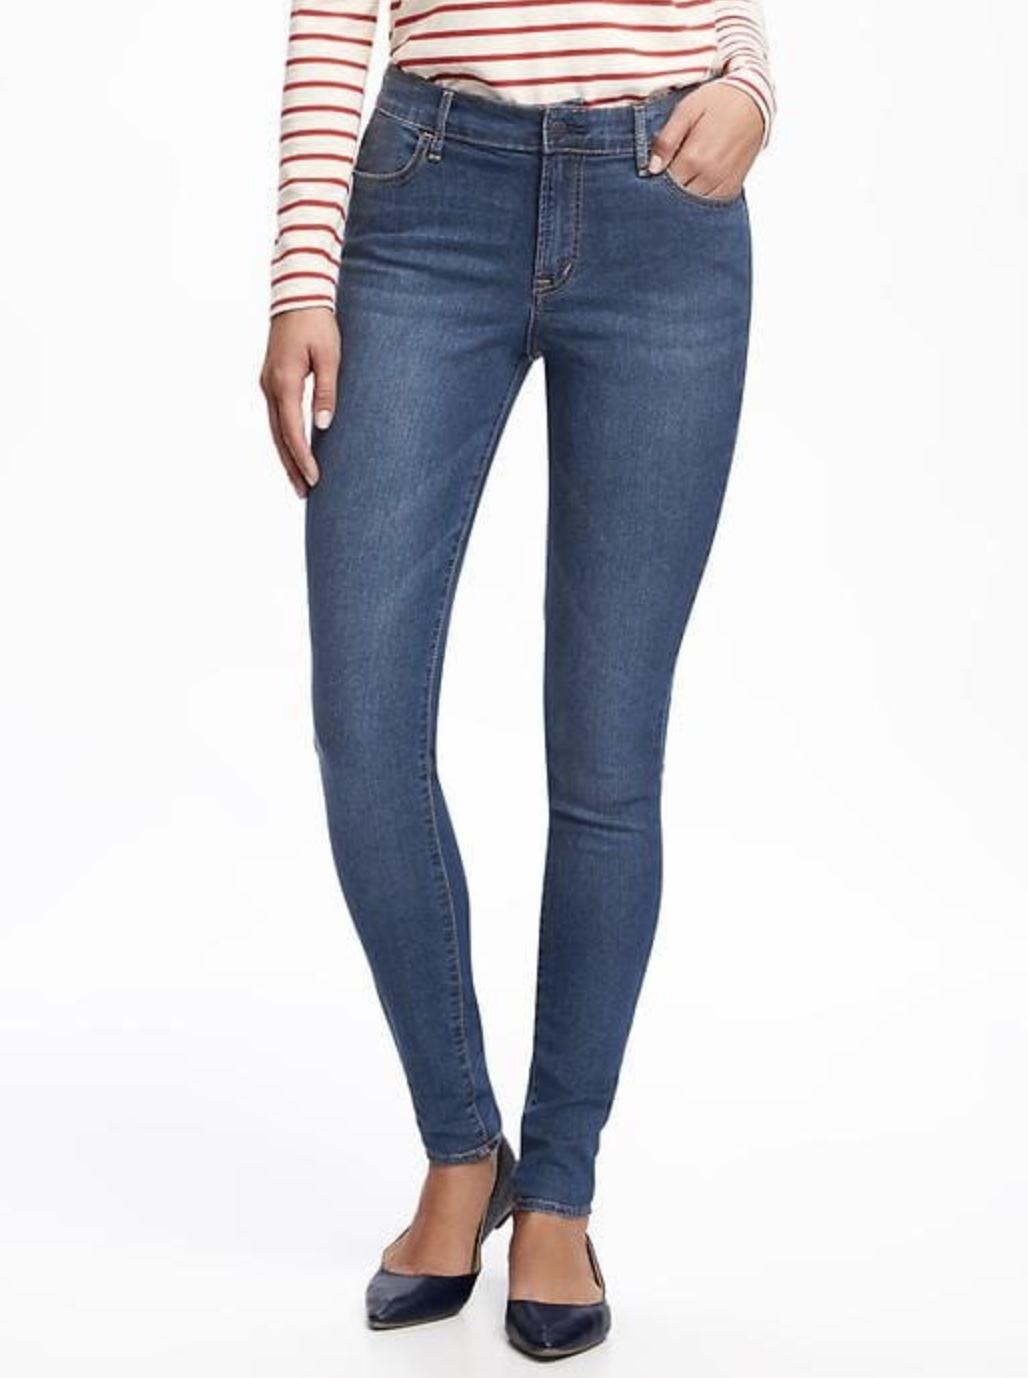 jeans on sale